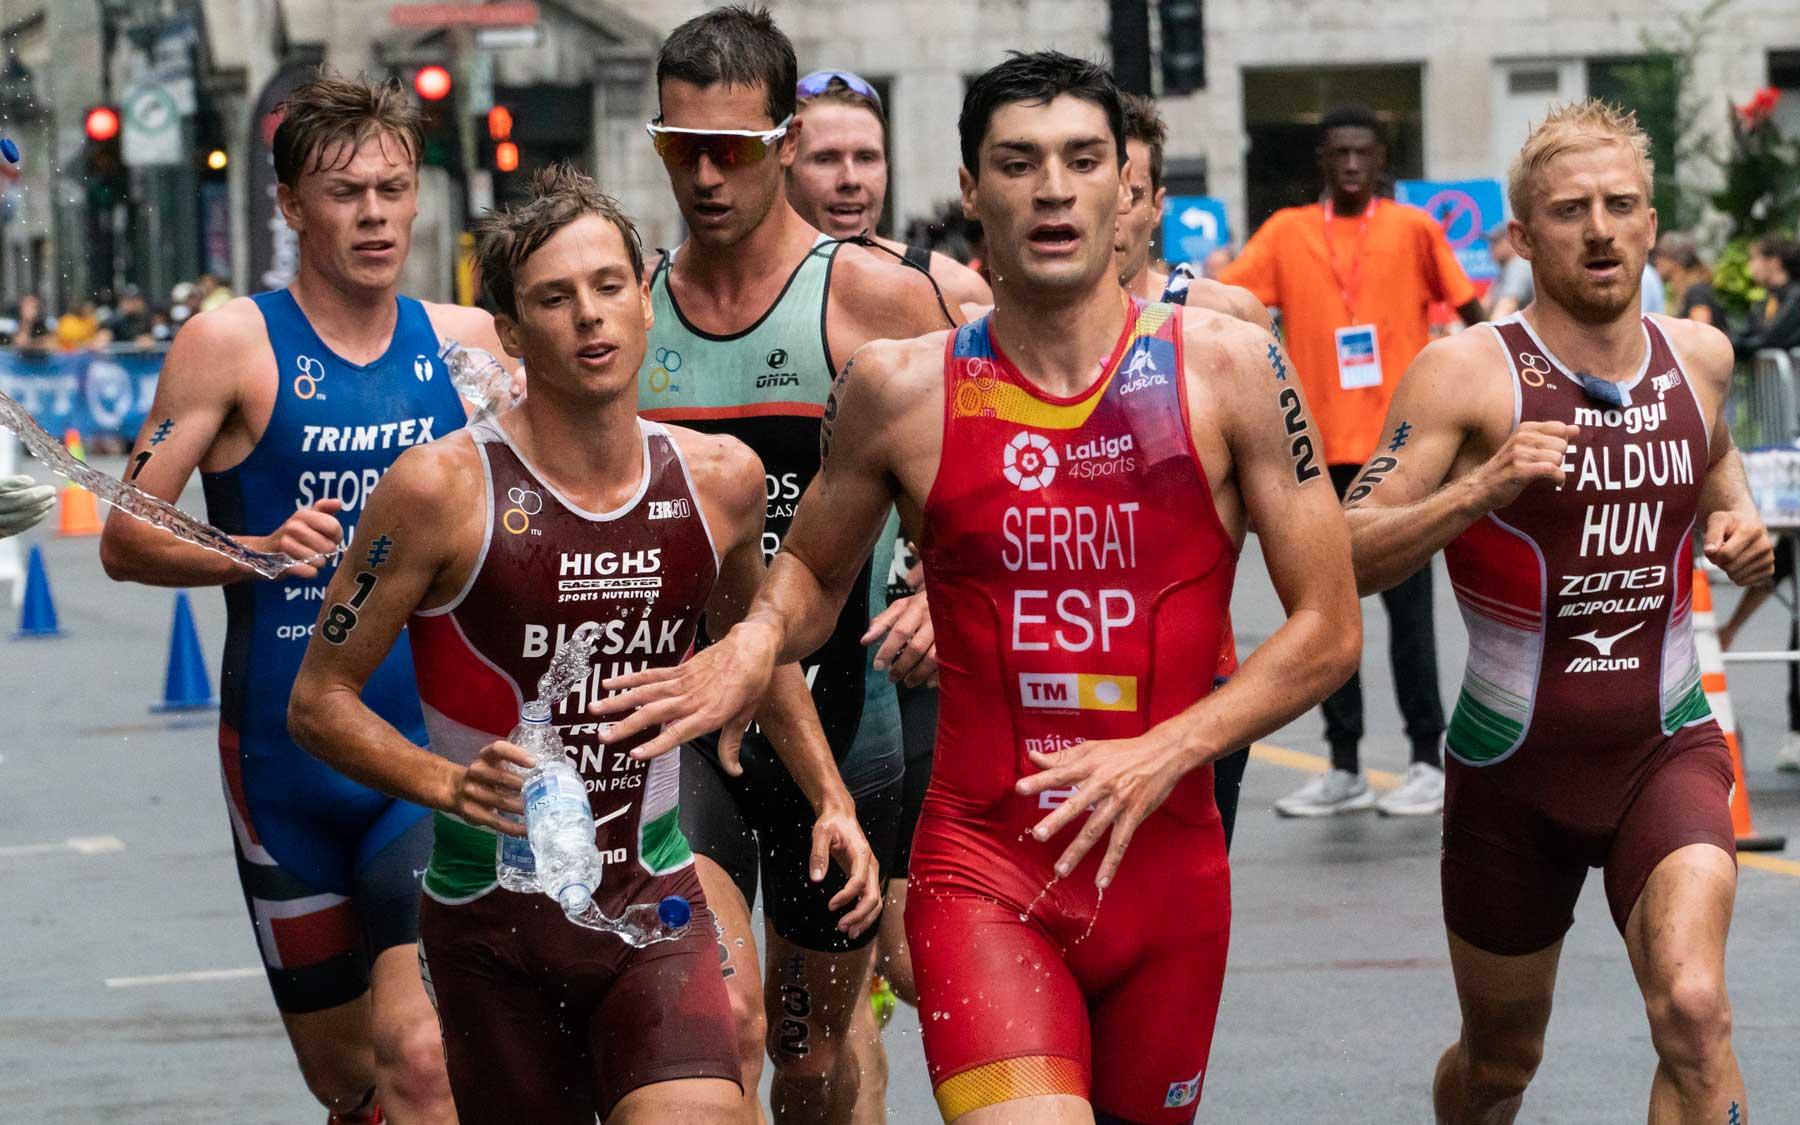 Antonio Serrat, Gabor Faldum, and Bence Bicsak on the final lap.